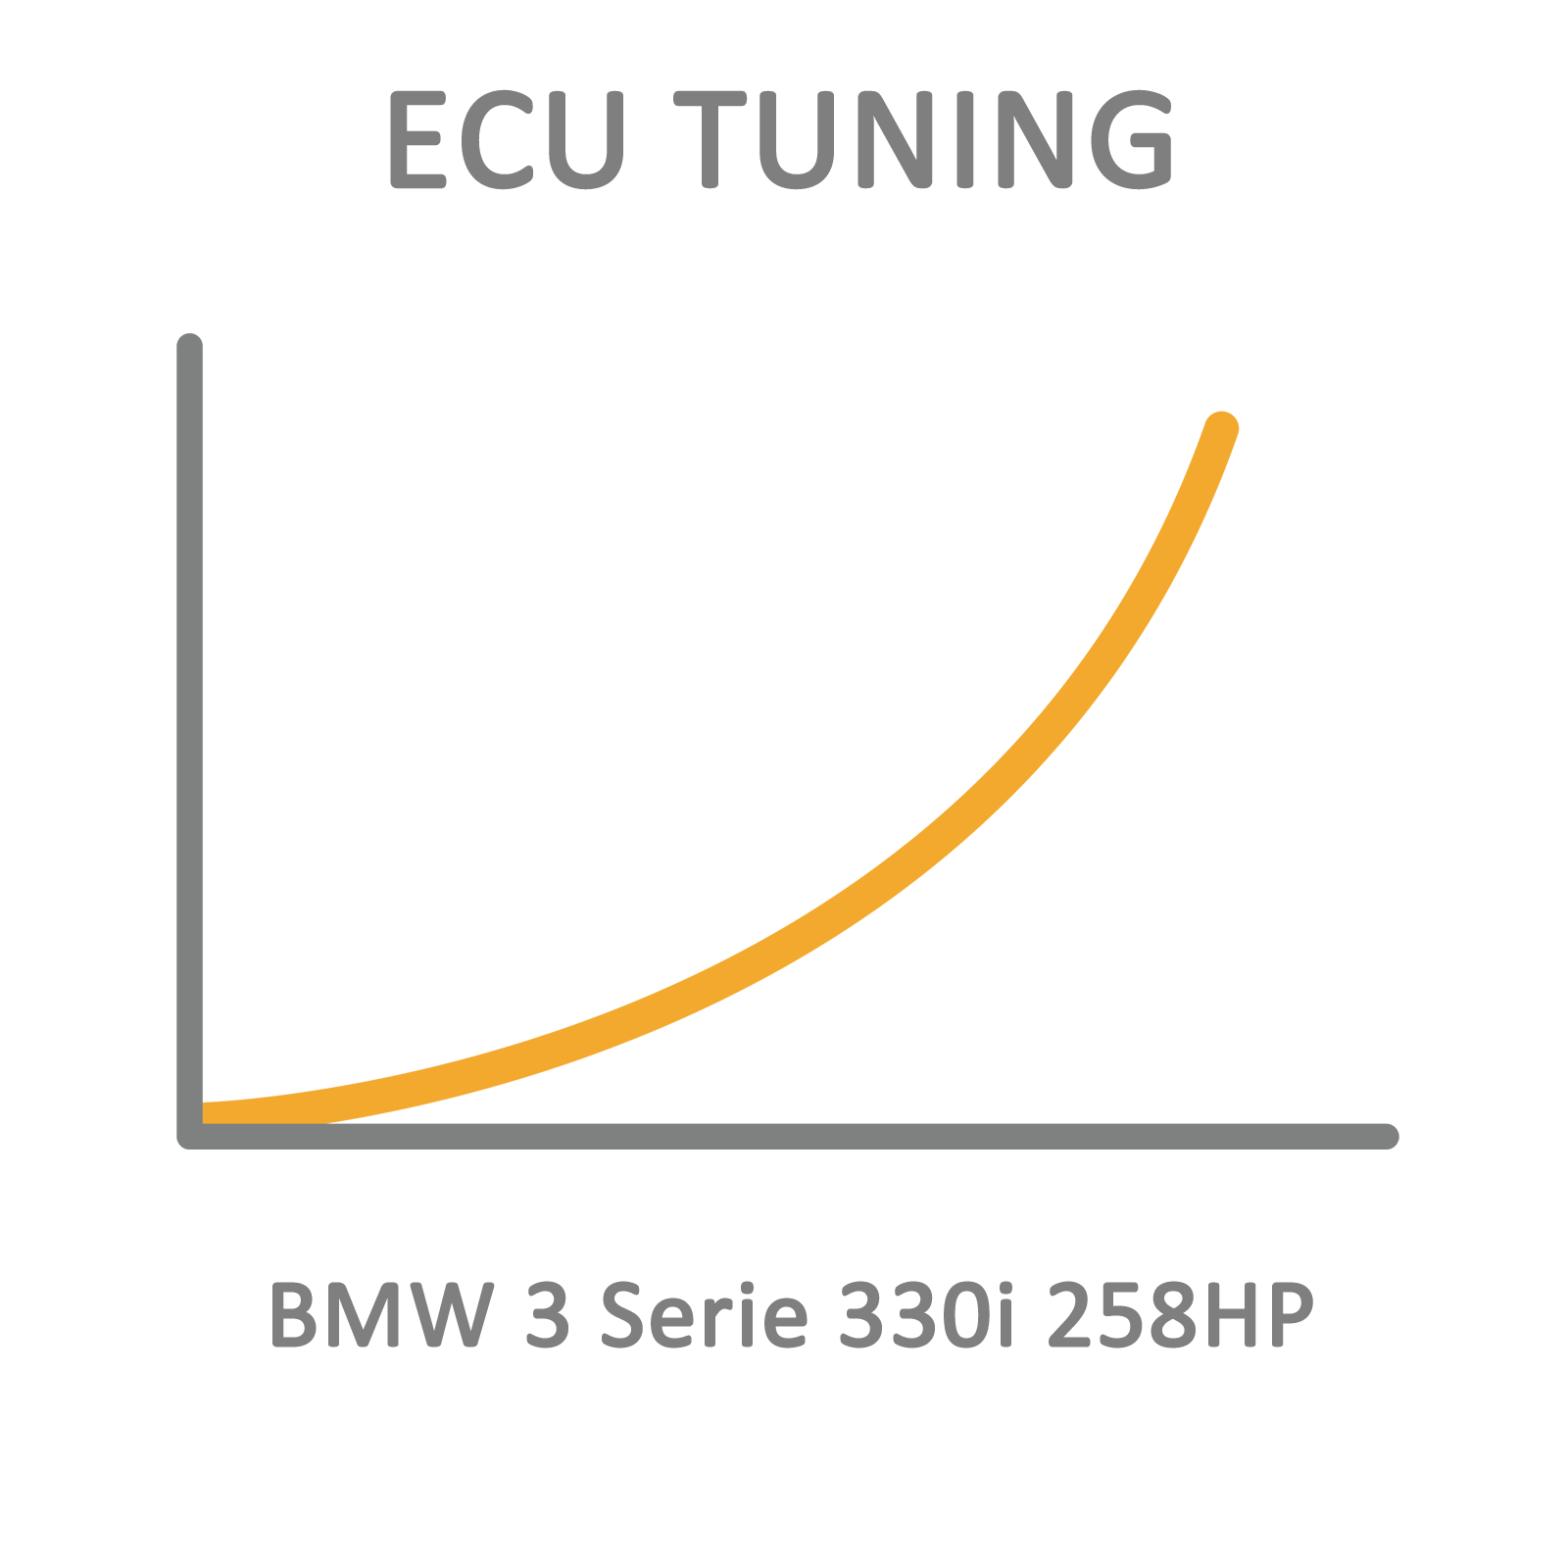 BMW 3 Series 330i 258HP ECU Tuning Remapping Programming